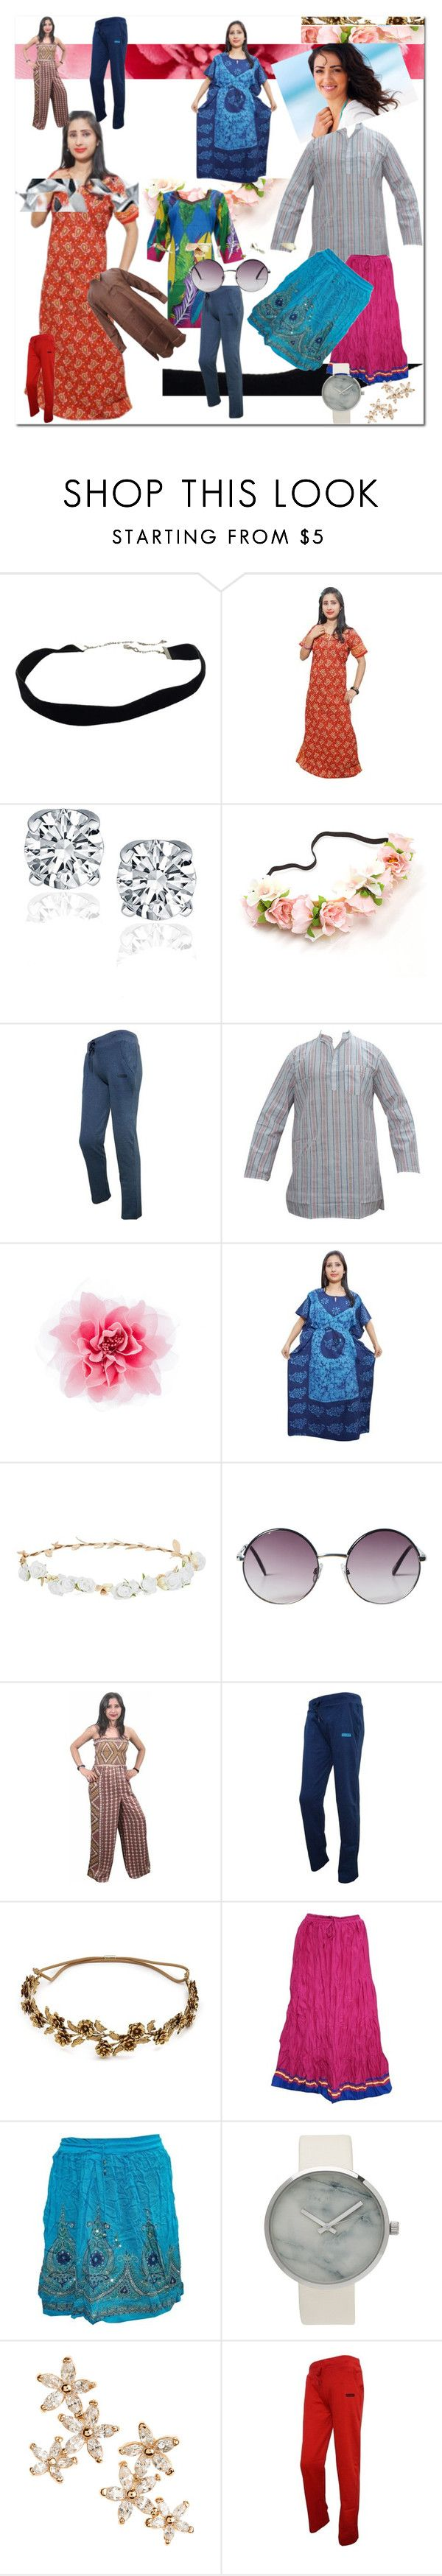 INDIATRENDZS WOMENS FASHION COLLECTION by globaltrendzs-flipkart on Polyvore featuring Bonheur, Jennifer Behr, Robert Rose and Monki  http://www.flipkart.com/search?q=indiatrendzs&as=off&as-show=off&otracker=start #womens #fashion #summerfashion #trend